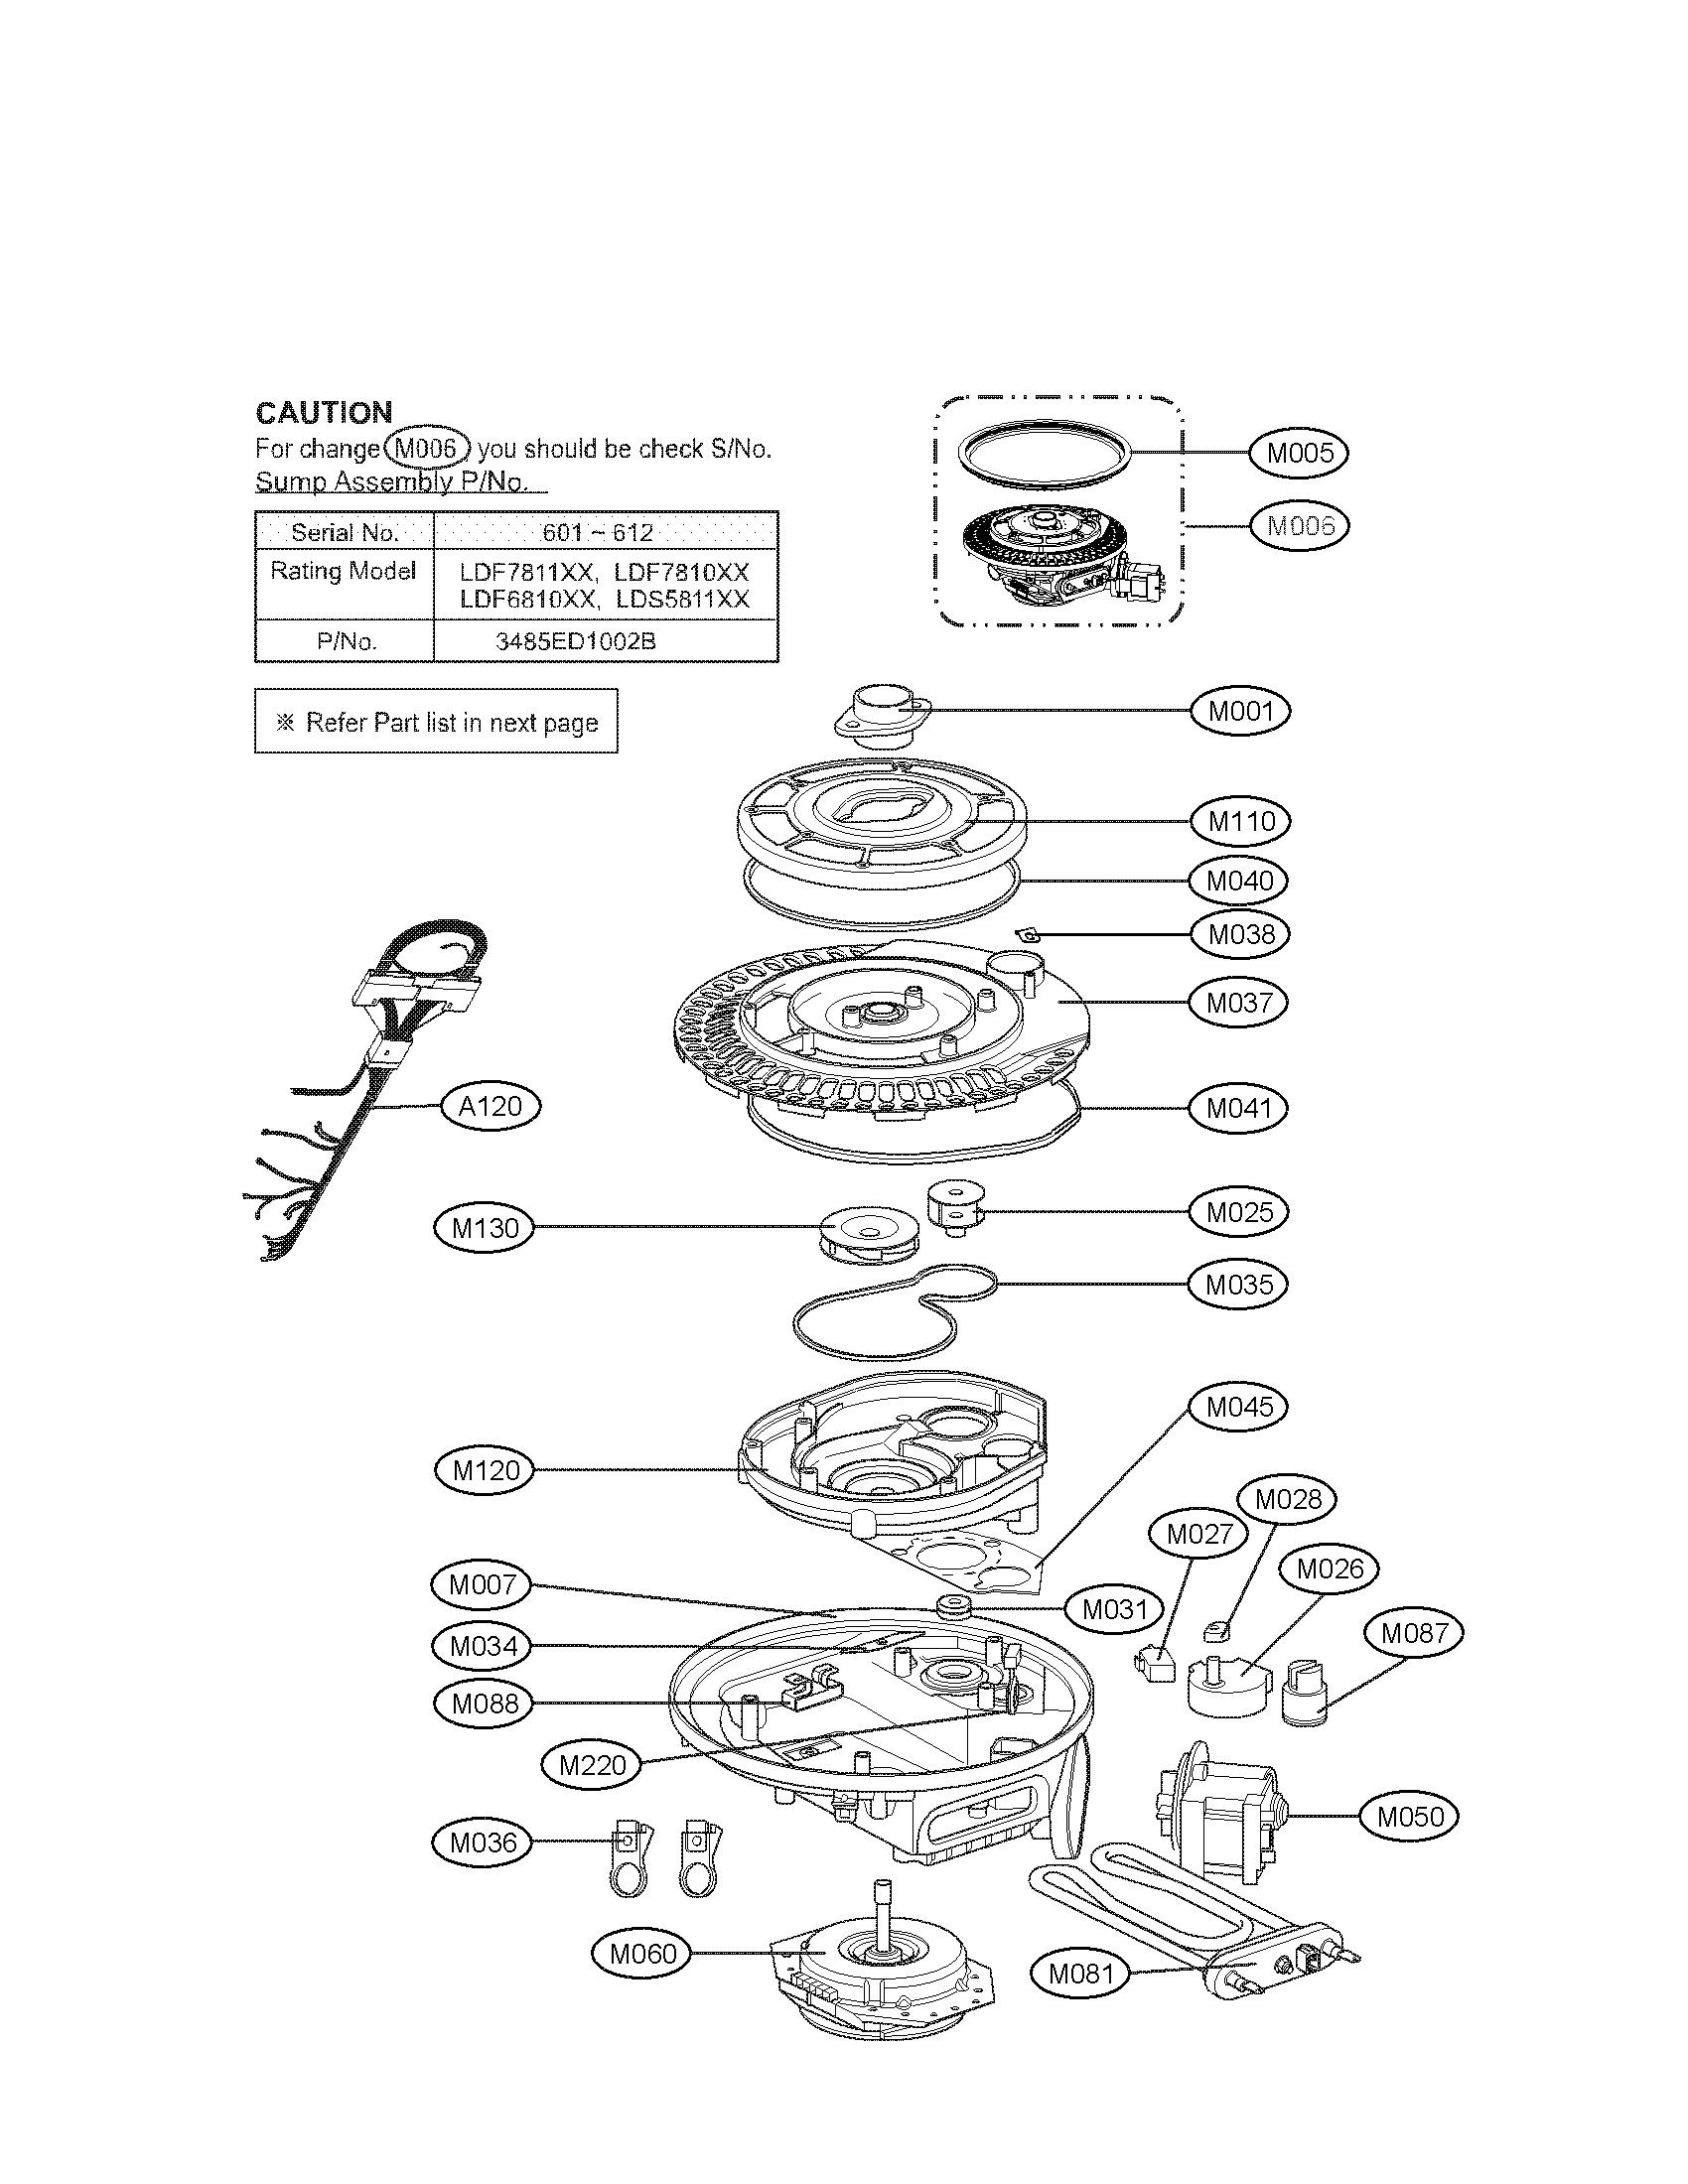 Lg model LDS5811ST-01 dishwasher genuine parts